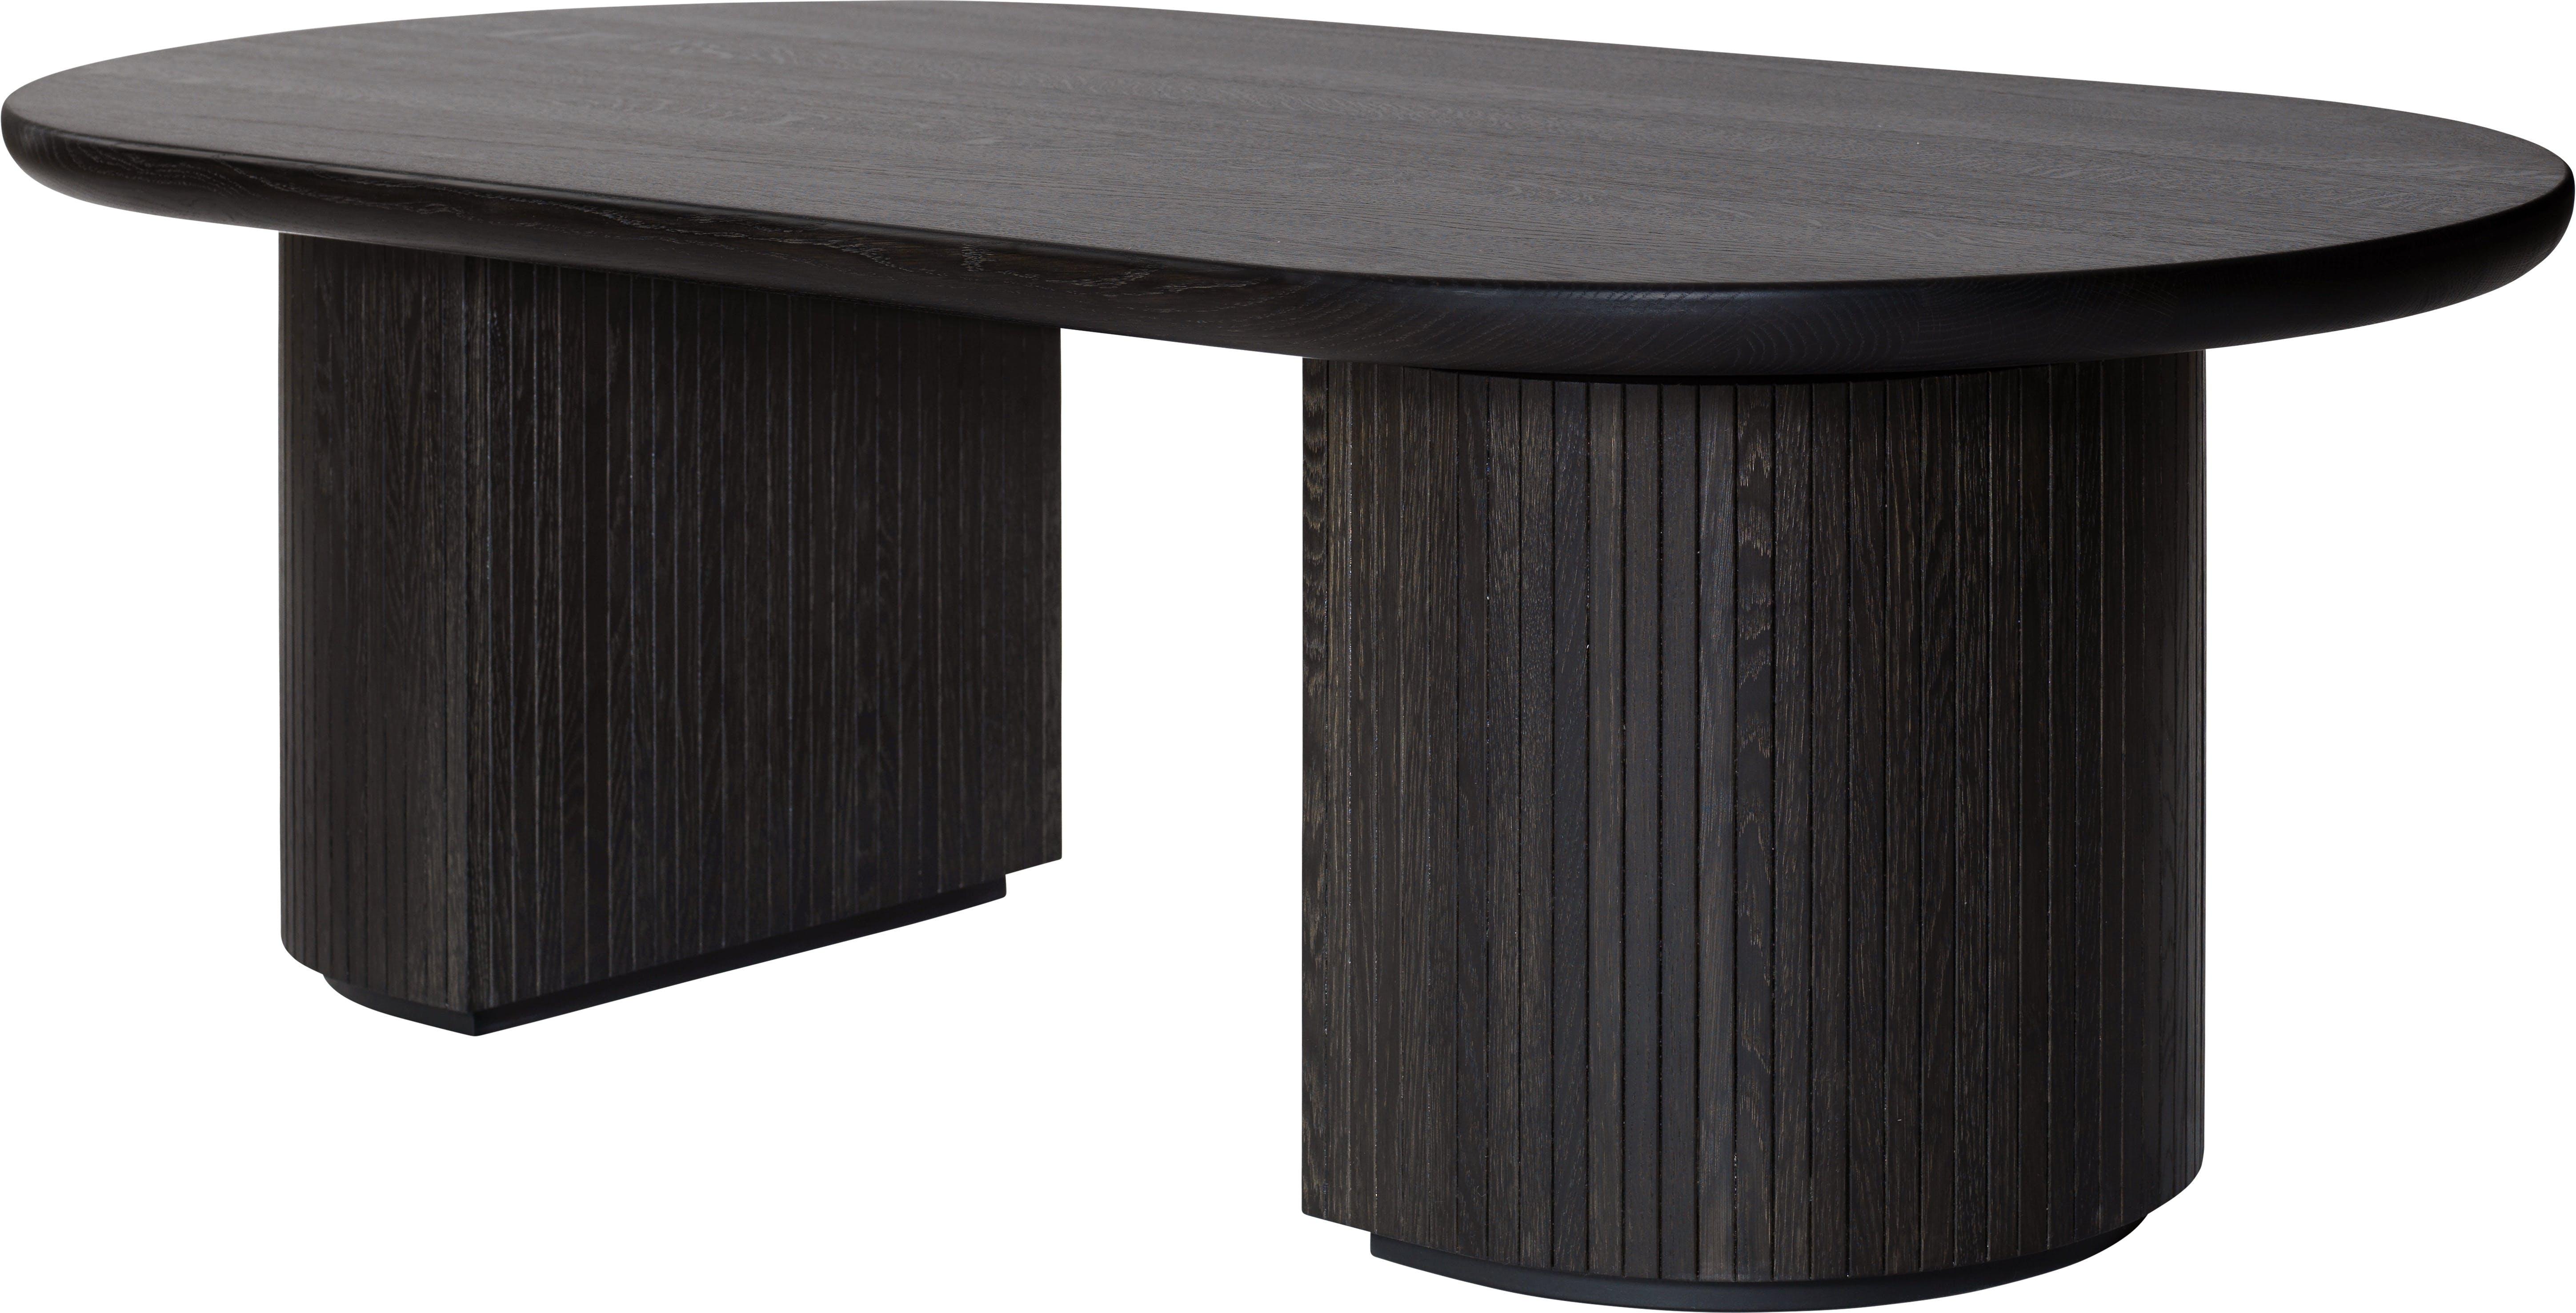 Gubi Moon Coffee Table Elliptical Side Haute Living